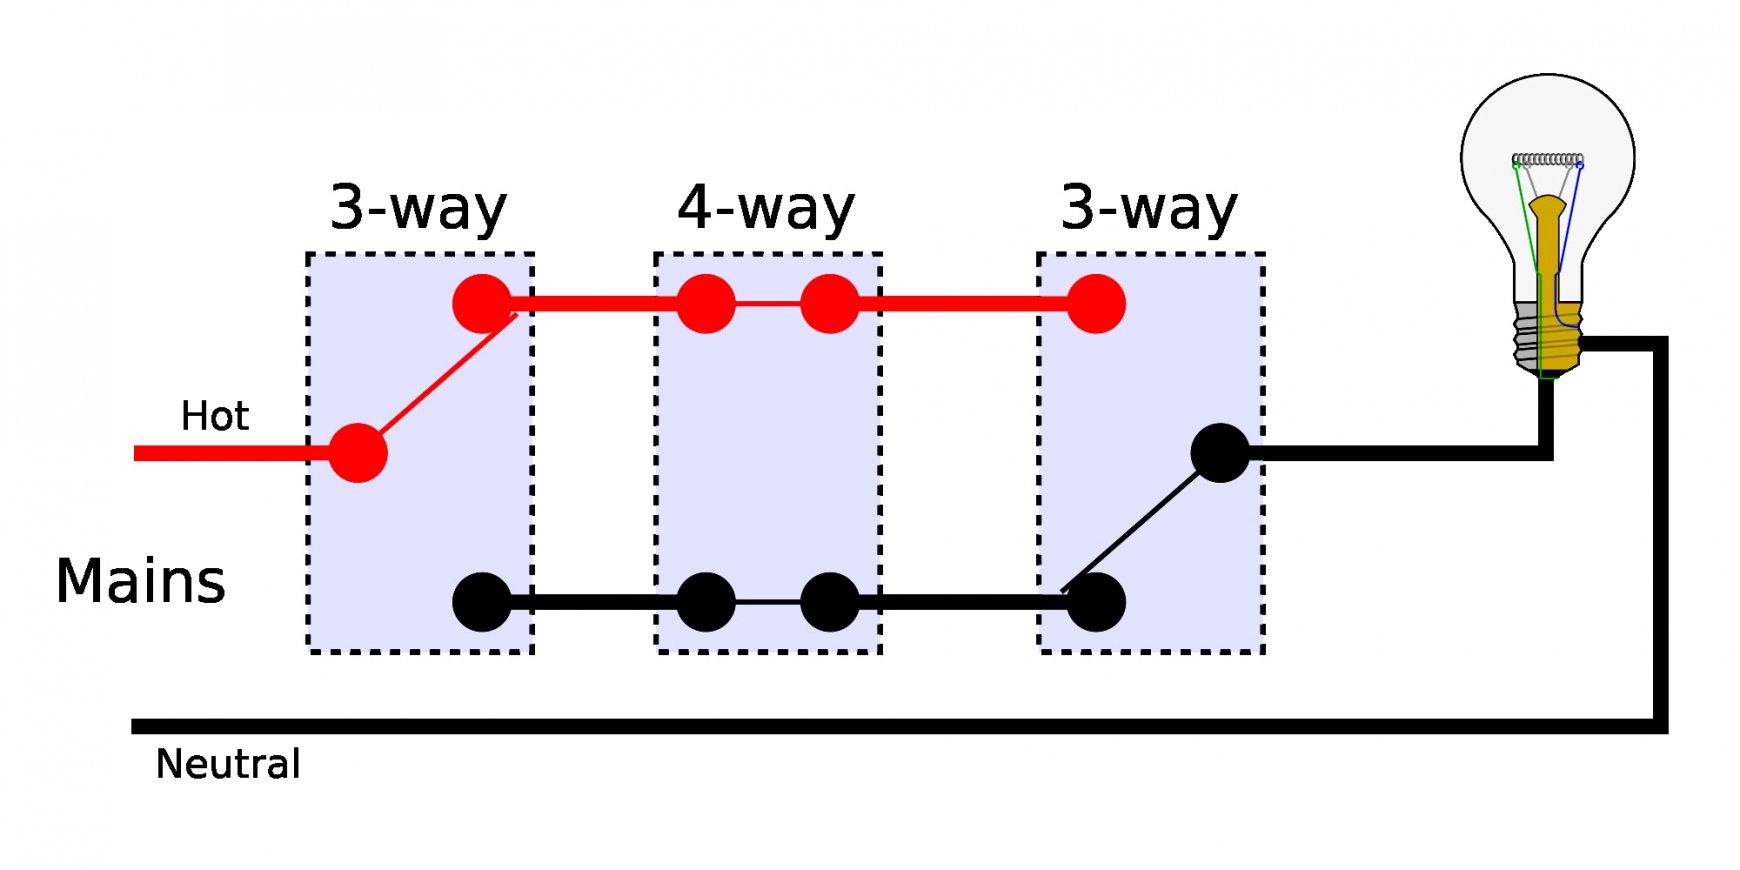 5 Way Switch Light Wiring Diagram - Wiring Diagram Database - 4 Way Switch Wiring Diagram Multiple Lights